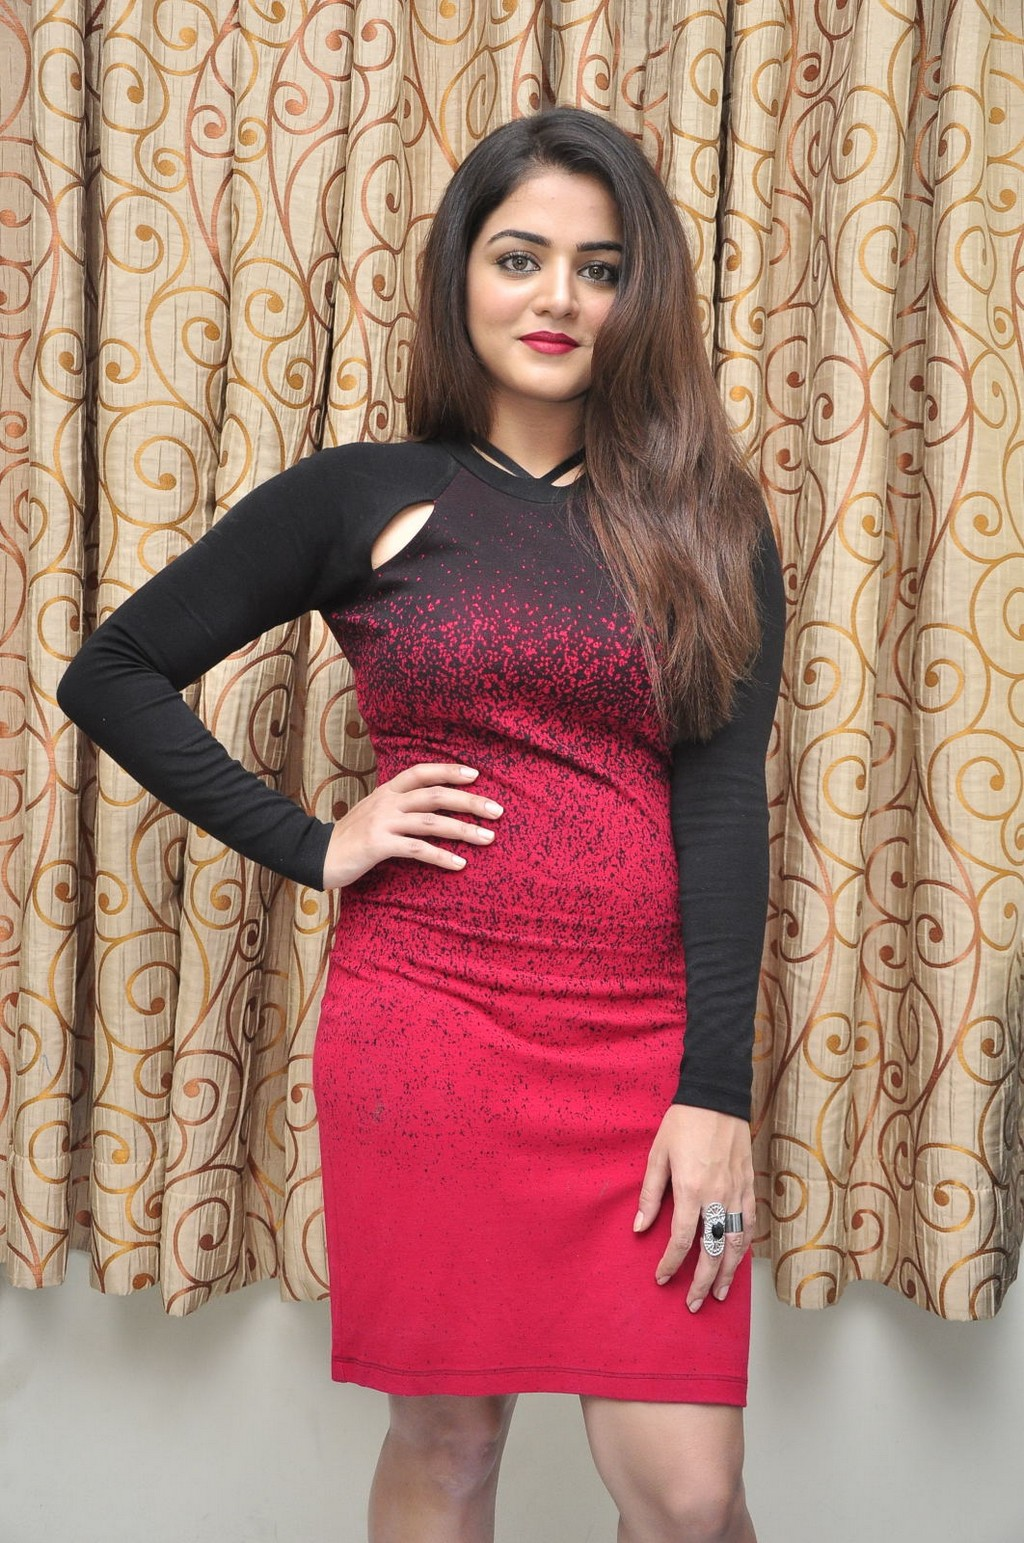 Glamours Tollywood Actress Wamiqa Gabbi Hot Stills In Red Dress